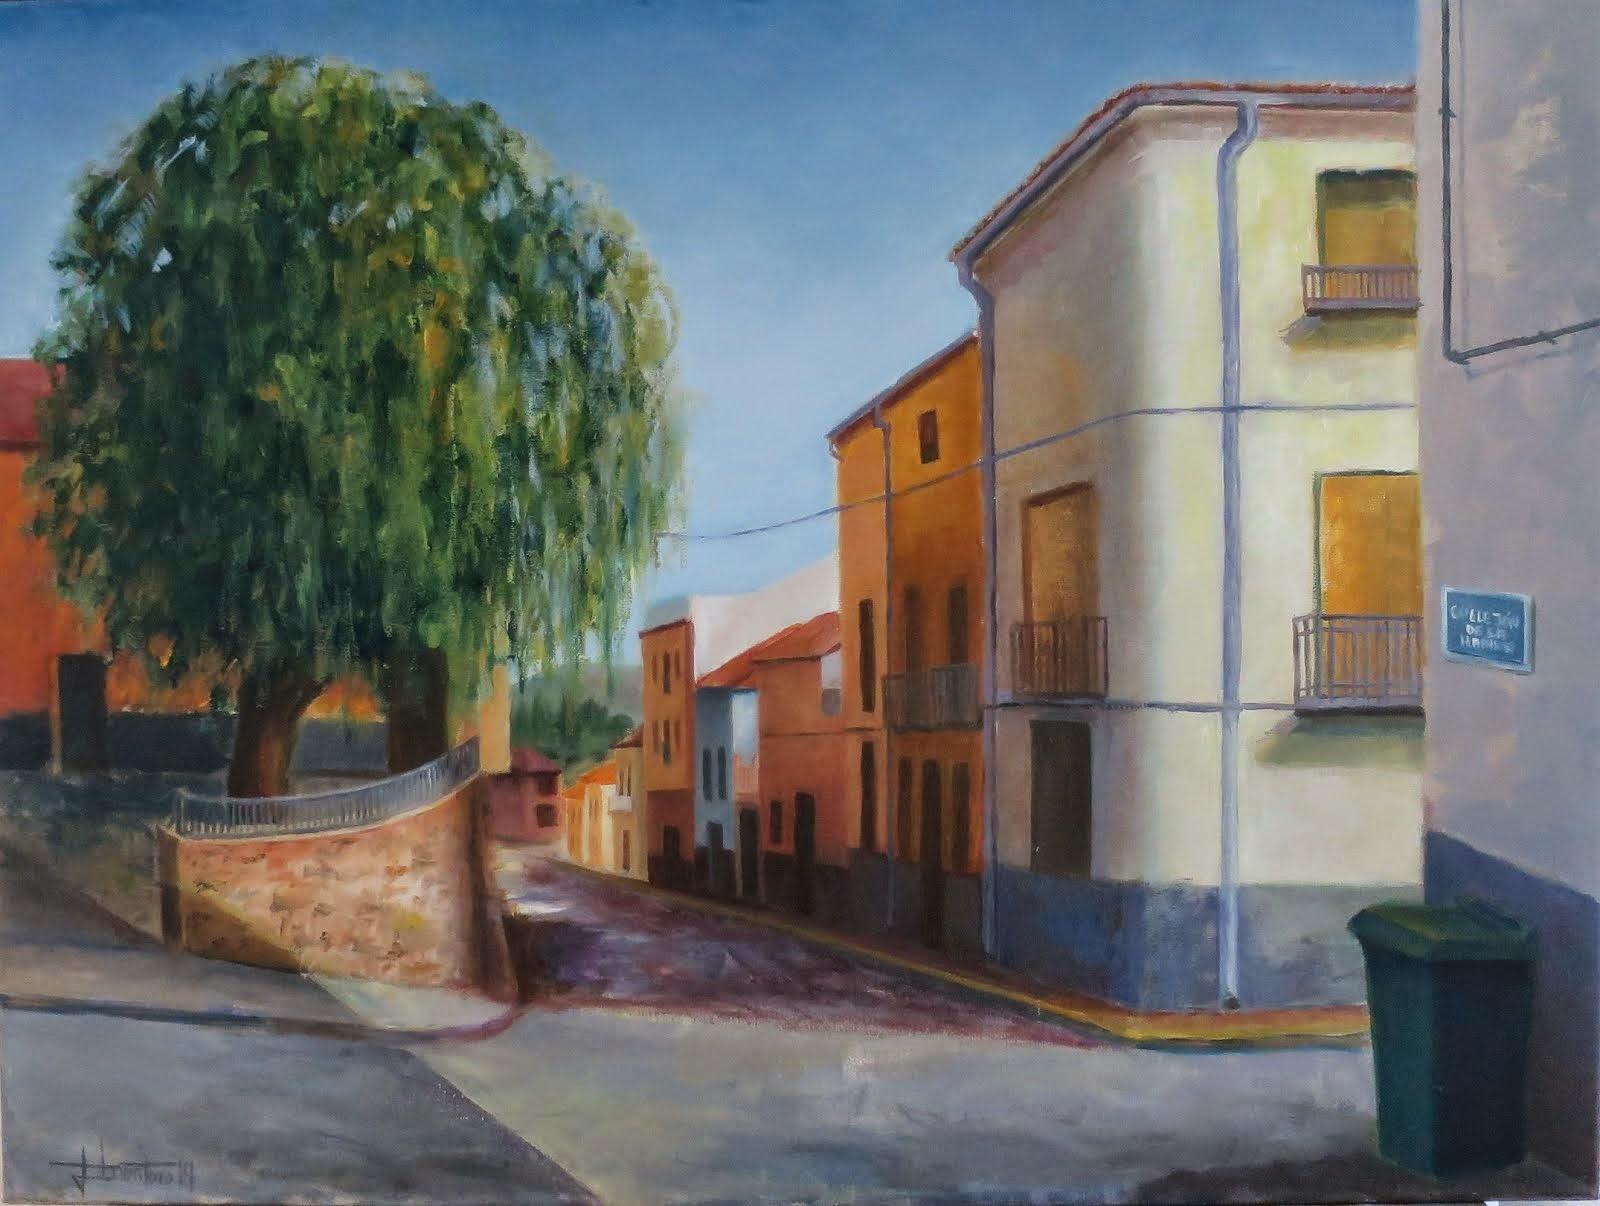 Calle del Pillar, II; Fuerte del Rey. (12P)